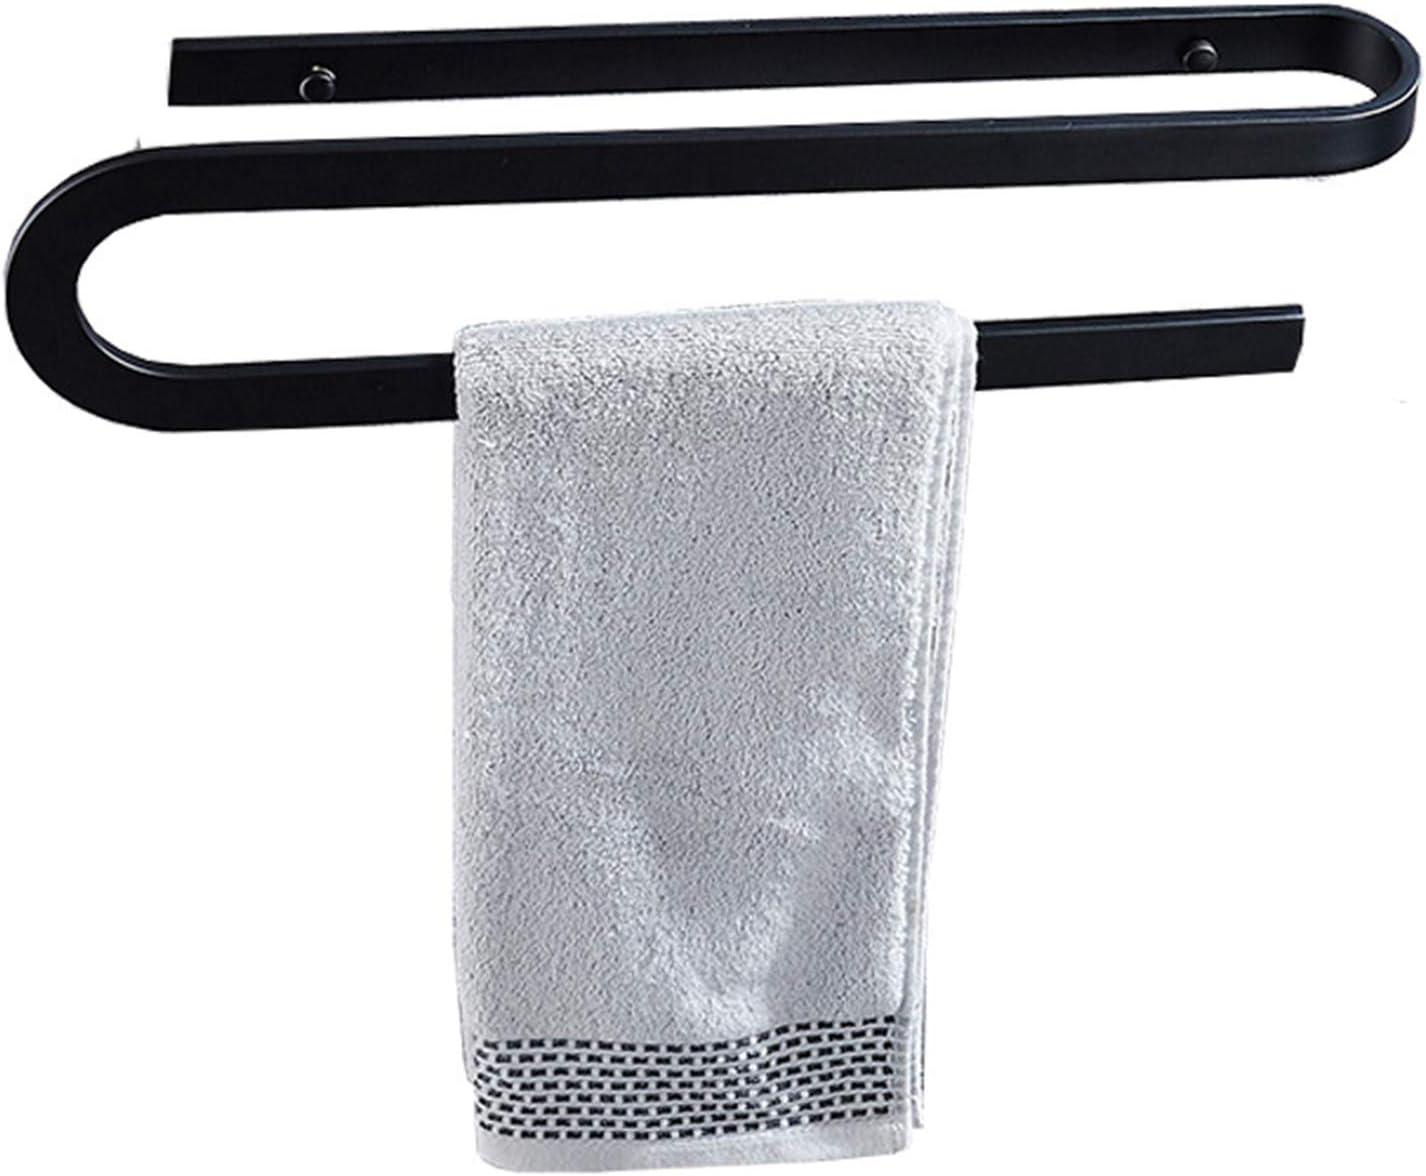 Black Towel Rack S-Shaped Max 73% OFF Single Space Genuine Free Shipping Wall Aluminum Bar